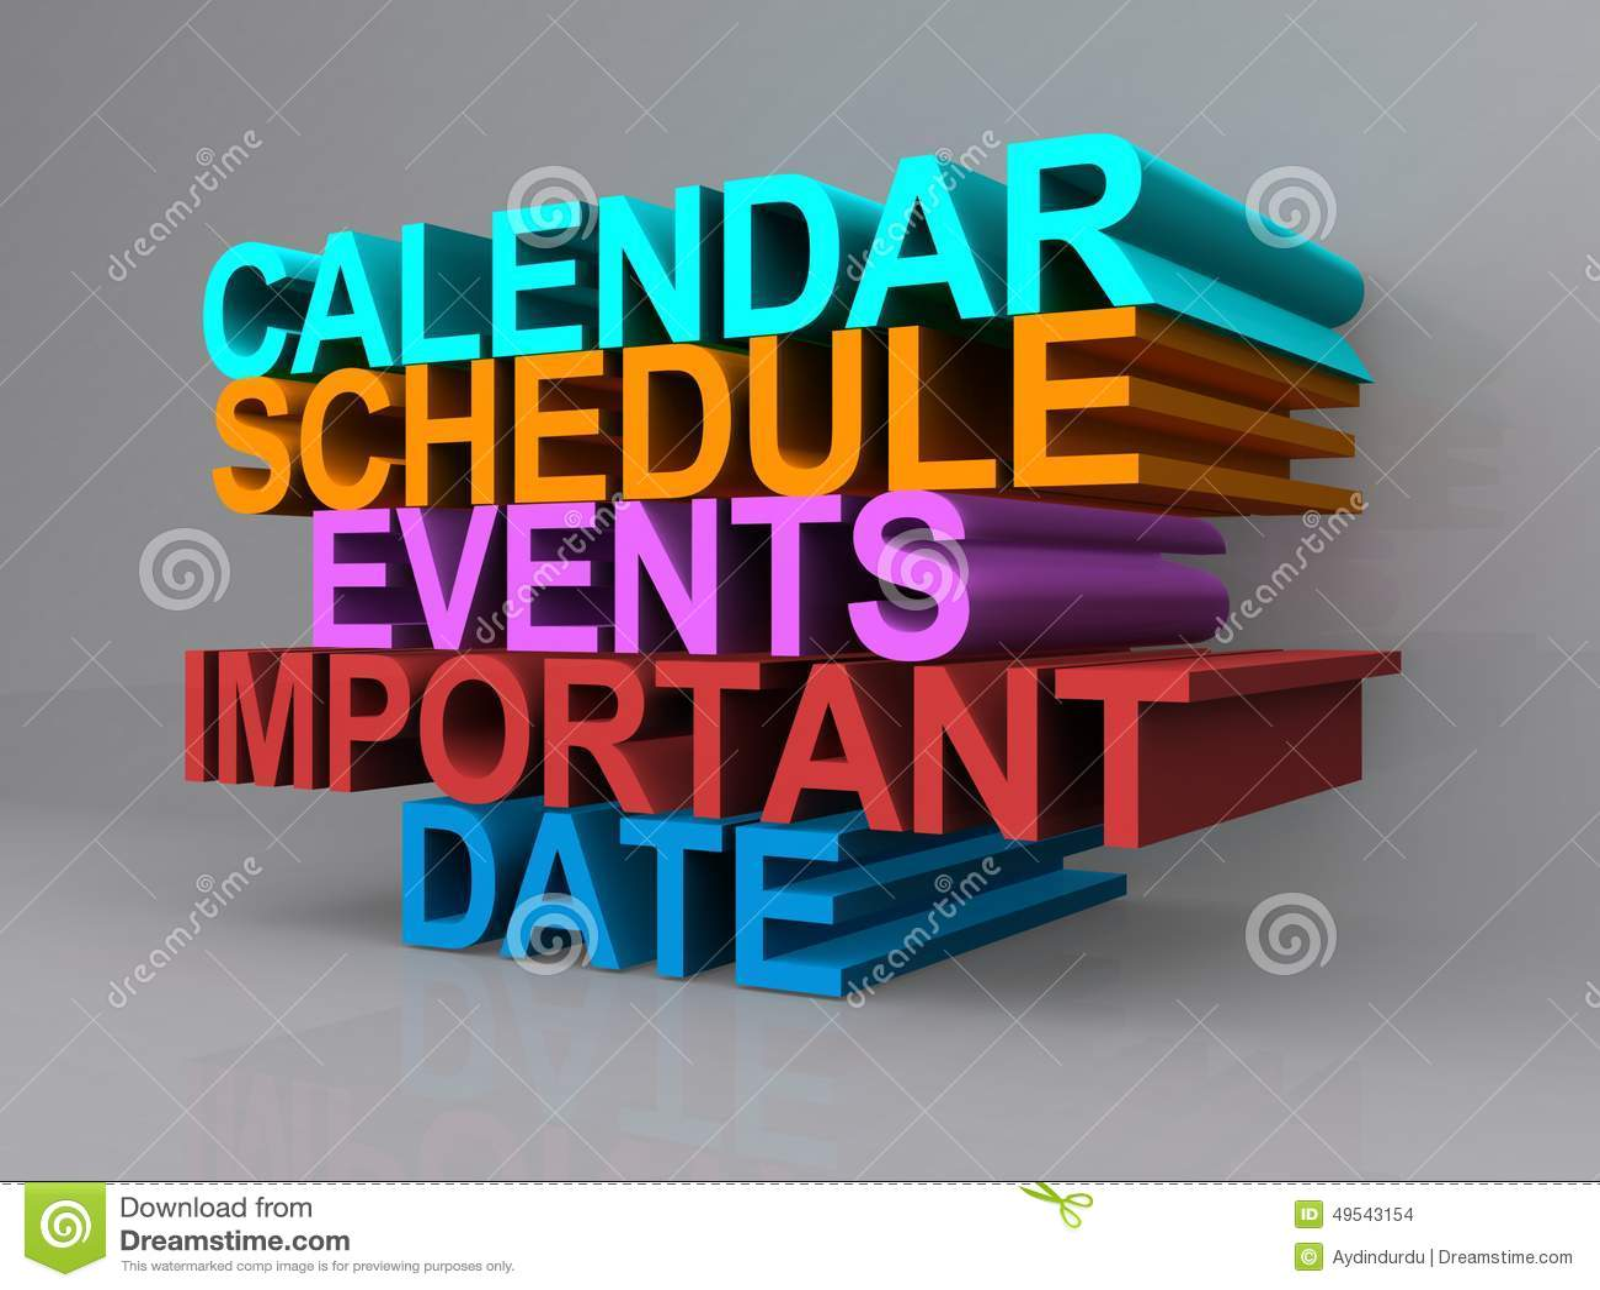 Calendar, schedule, events, important date